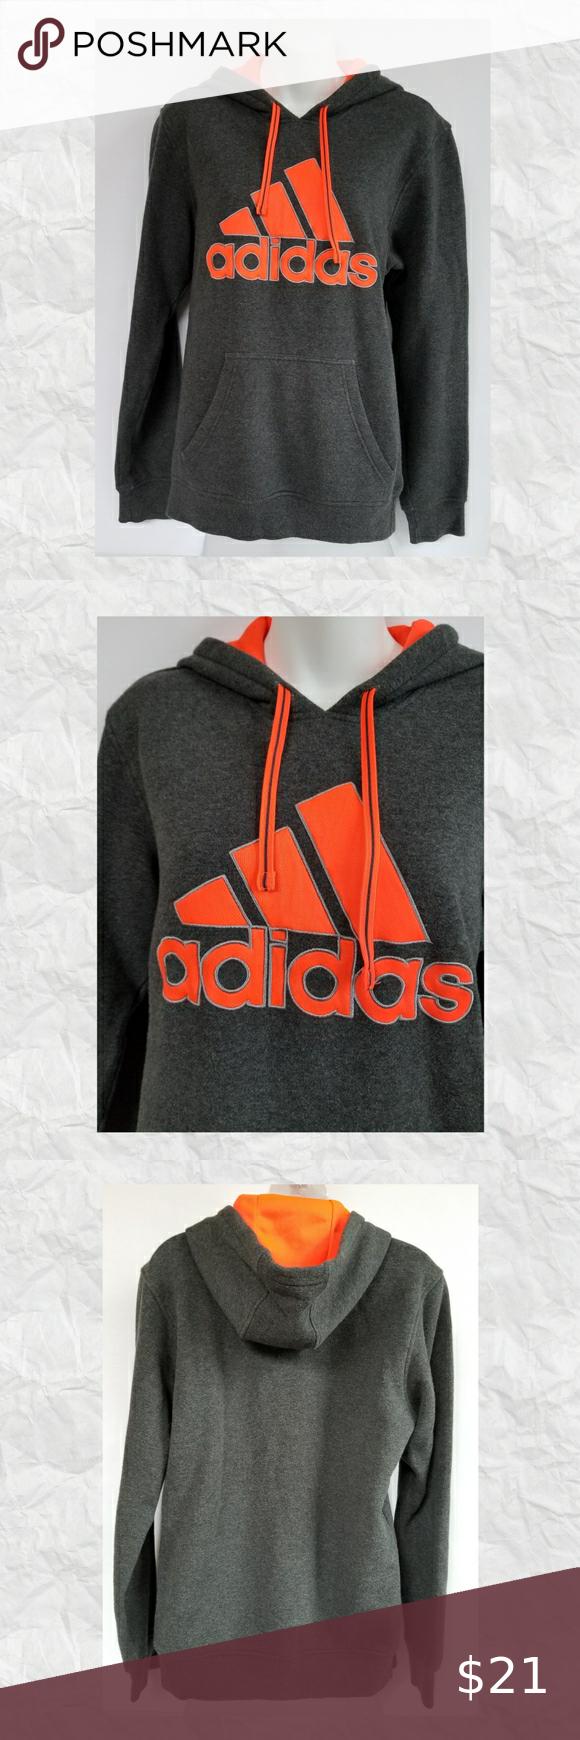 Adidas Sweatshirt Hoodie small Adidas Sweatshirt Hoodie